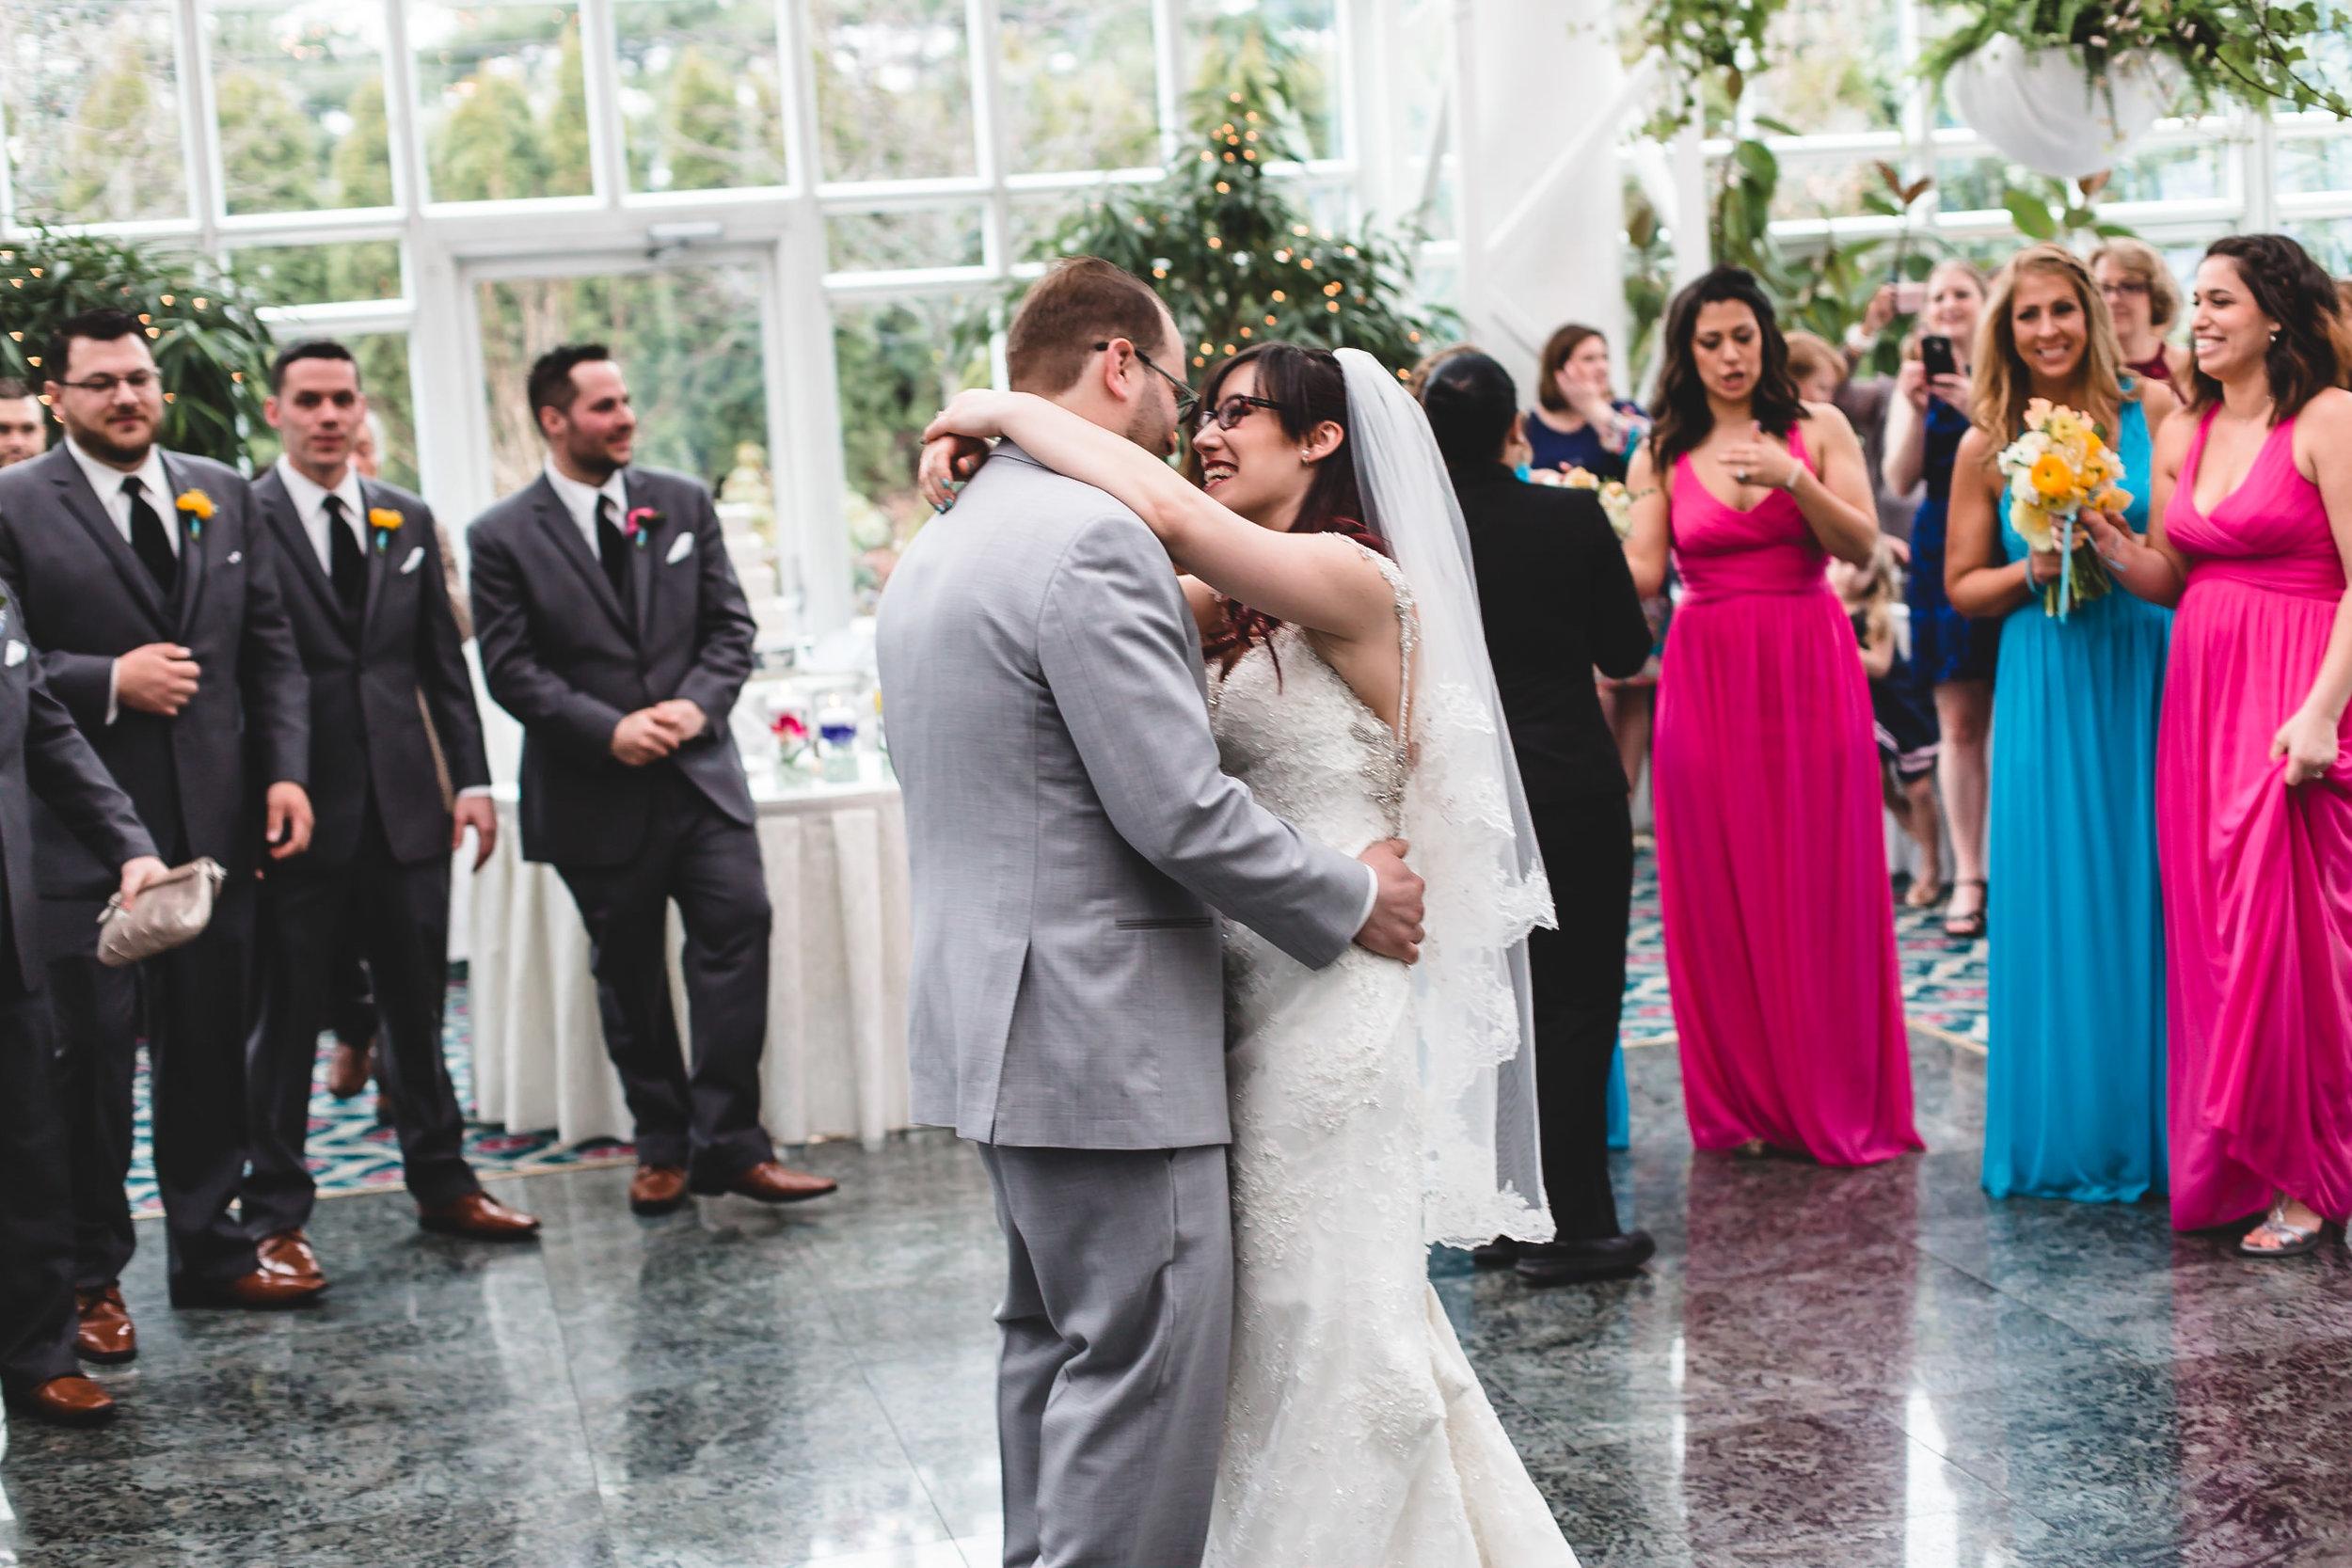 daniel_nydick_nj_photographer_headshot_wedding_event_family-19.jpg